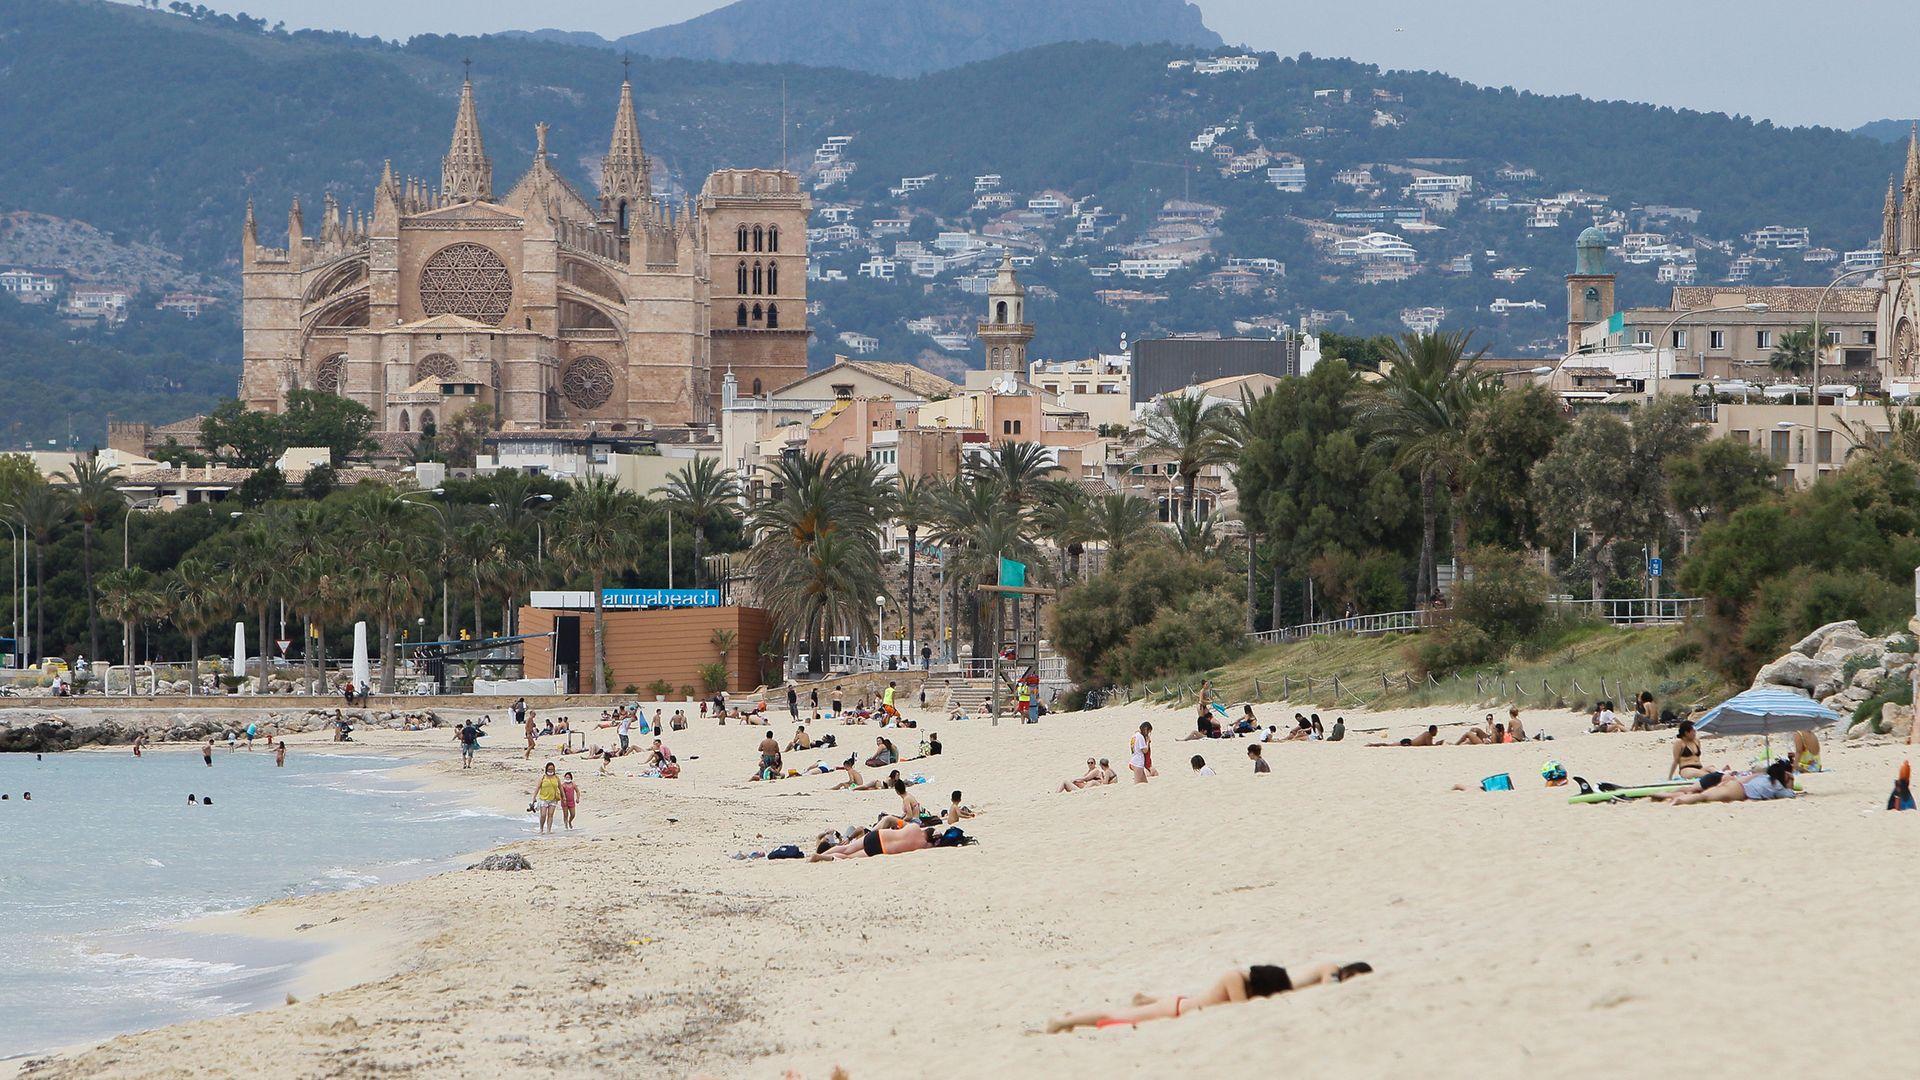 A quiet beach at Palma de Mallorca, in May 2020 - Credit: Europa Press via Getty Images